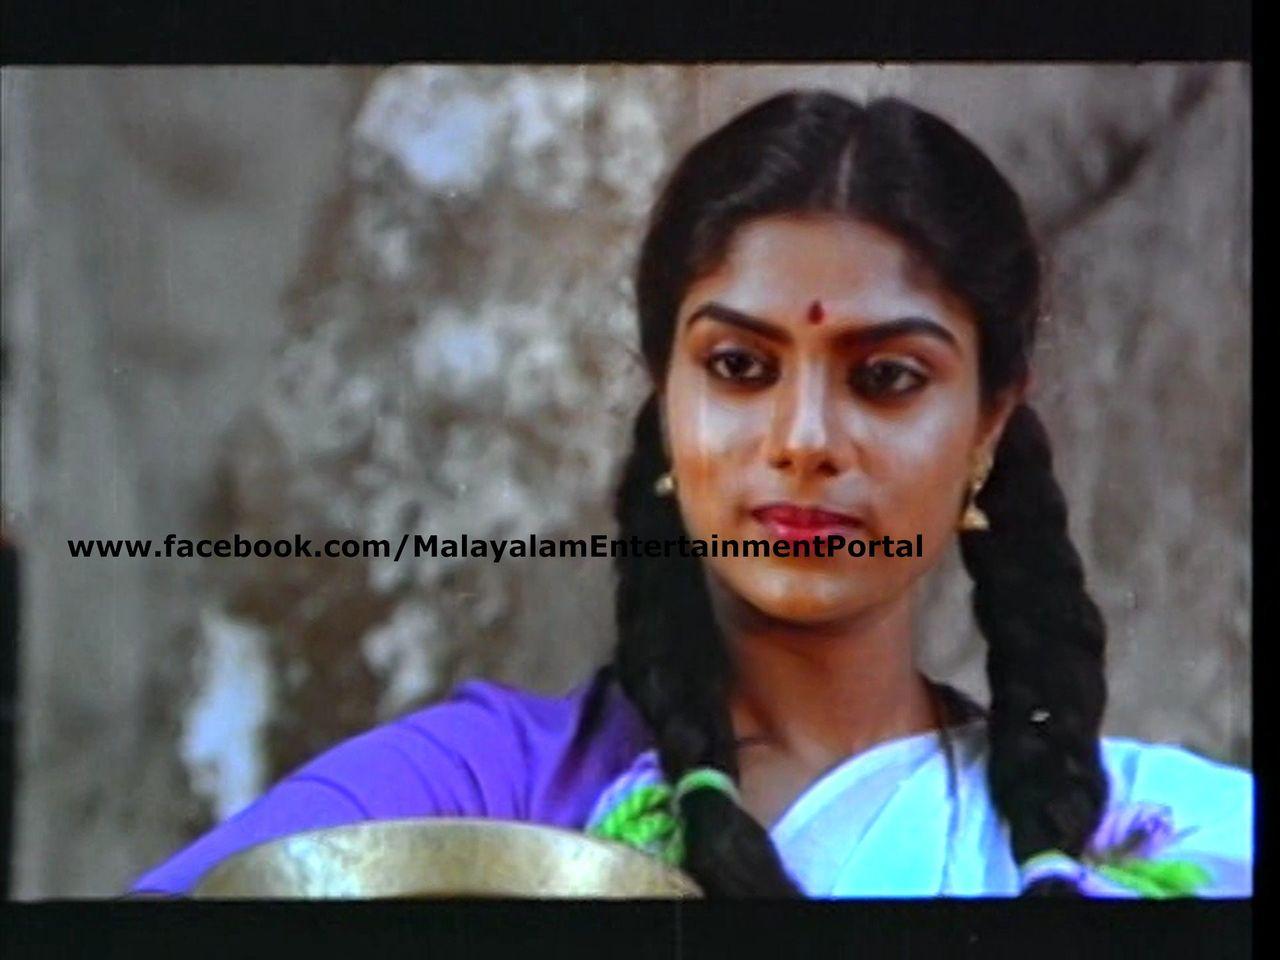 Mukundetta Sumithra Vilikyunnu Saina DVD Screenshots Bscap0007